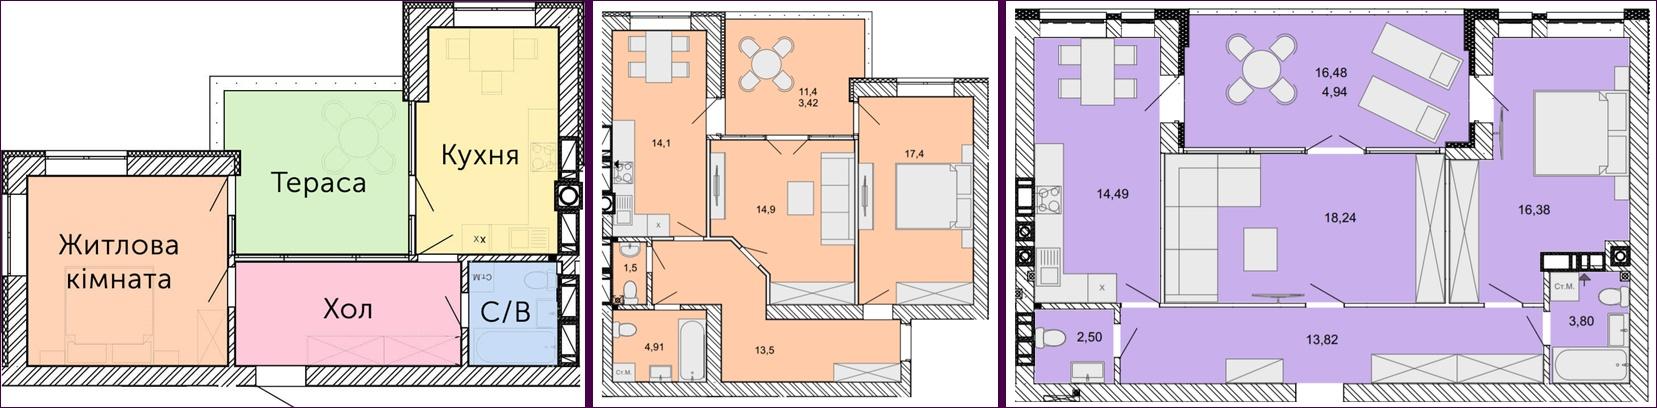 ЖК Найкращий квартал планировки квартир с террасой